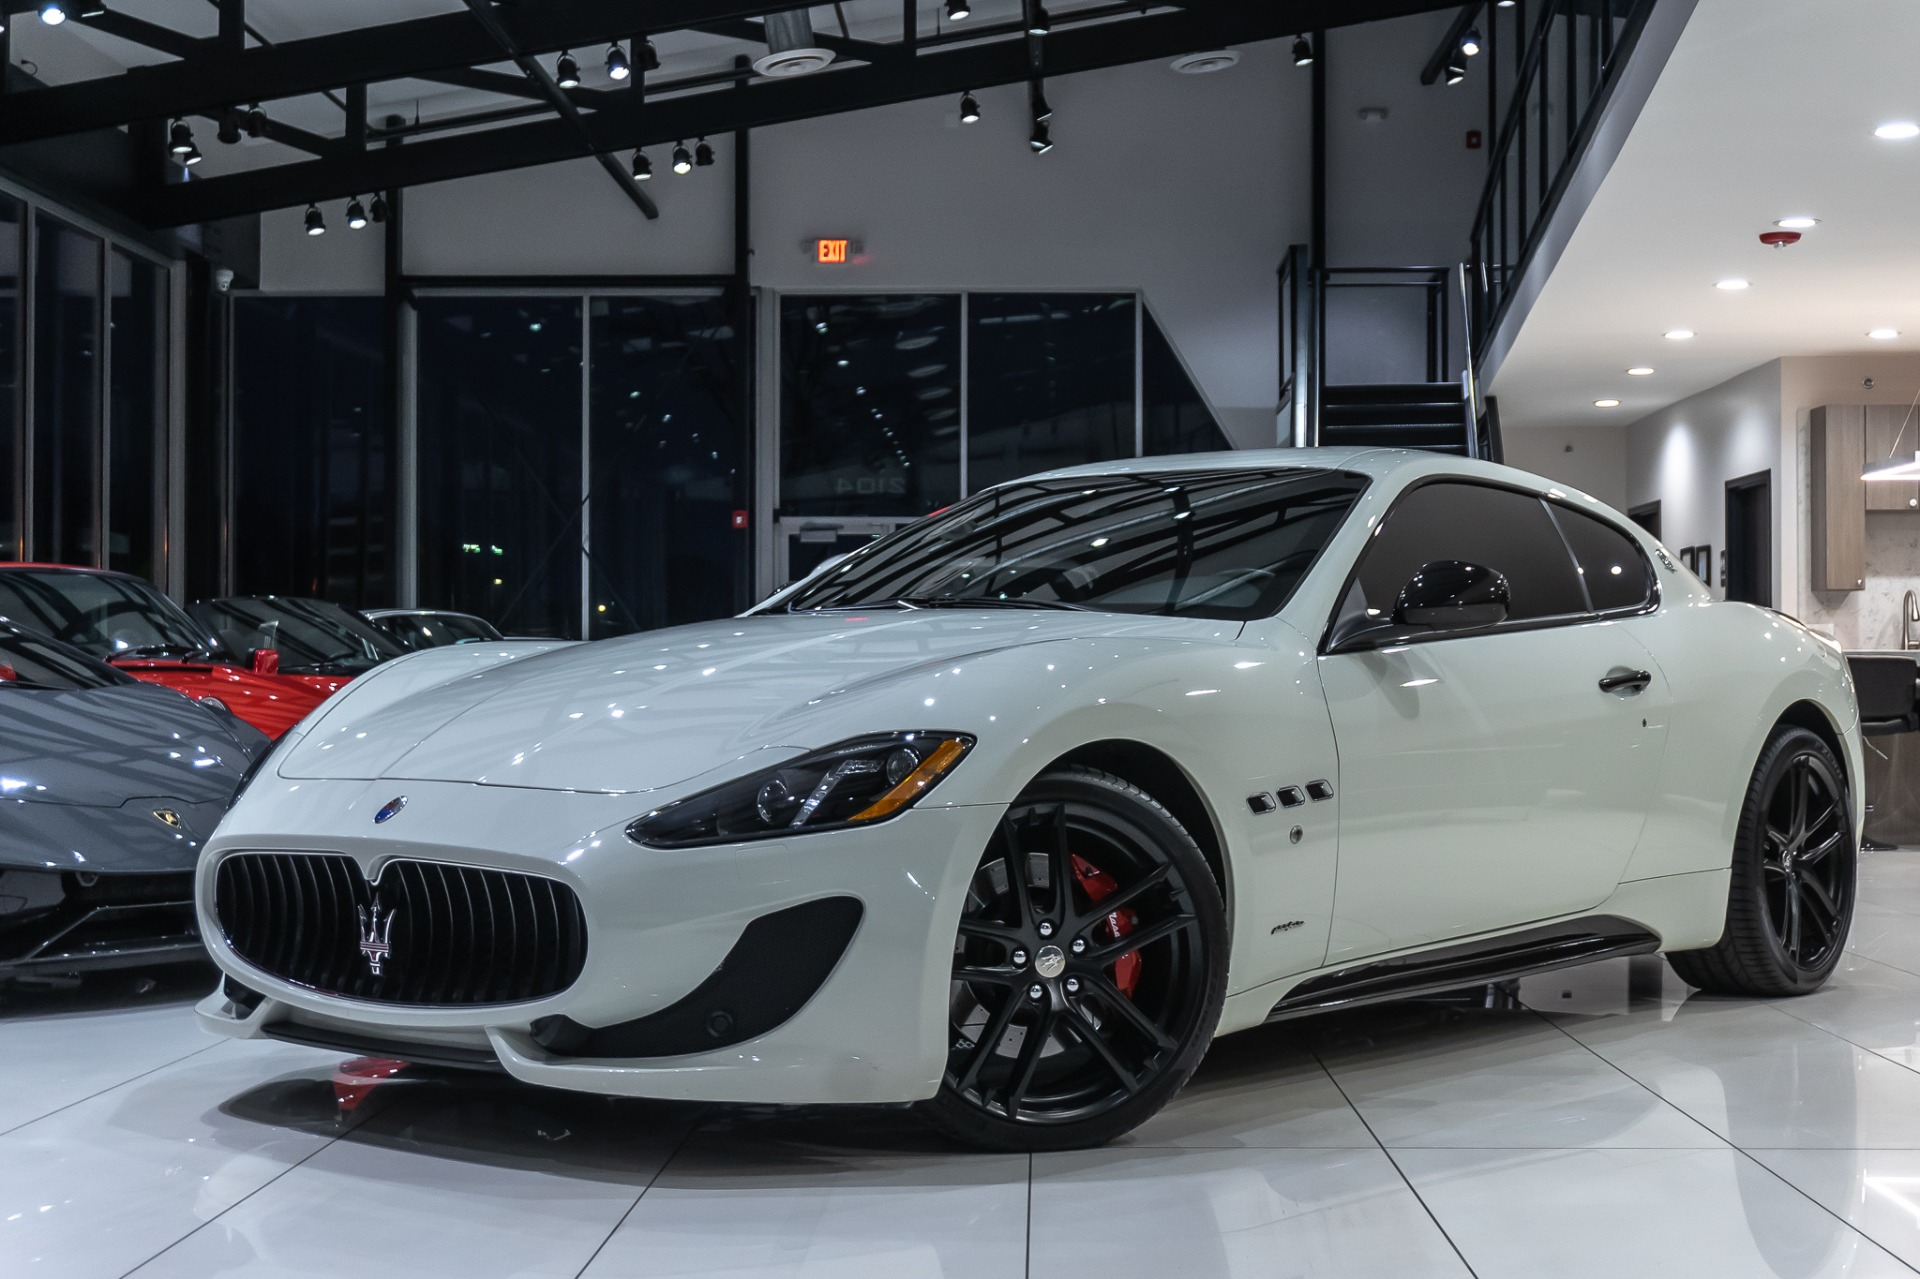 Used 2015 Maserati GranTurismo Sport Loaded! Carbon Fiber ...